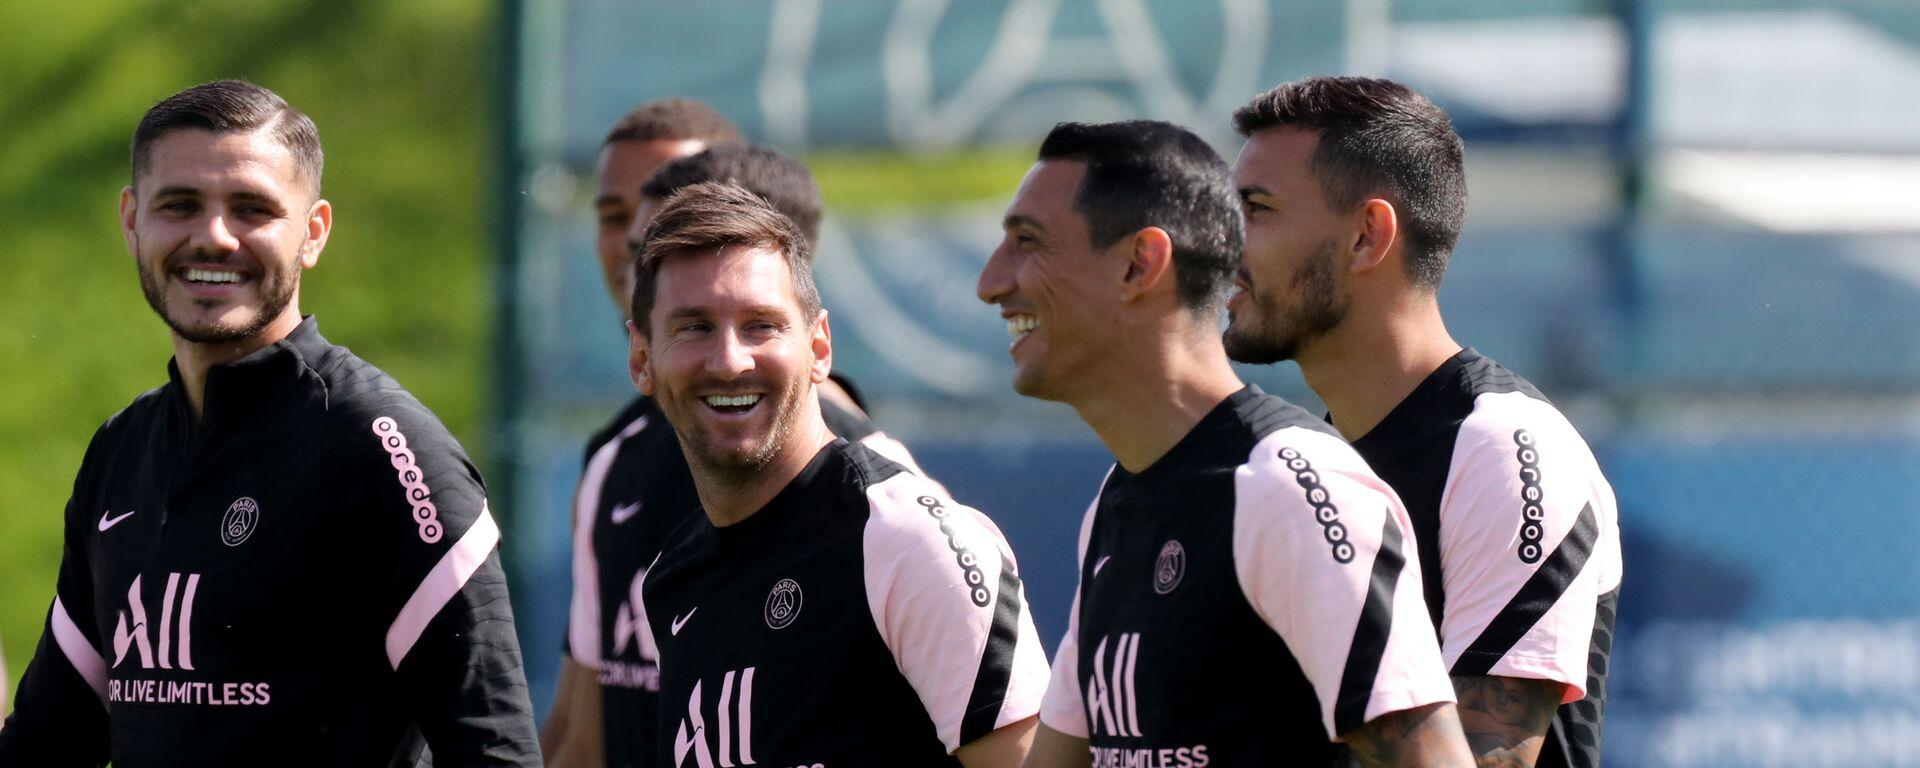 Lionel Messi và Angel Di Maria từ Paris Saint-Germain trong buổi tập luyện - Sputnik Việt Nam, 1920, 28.09.2021